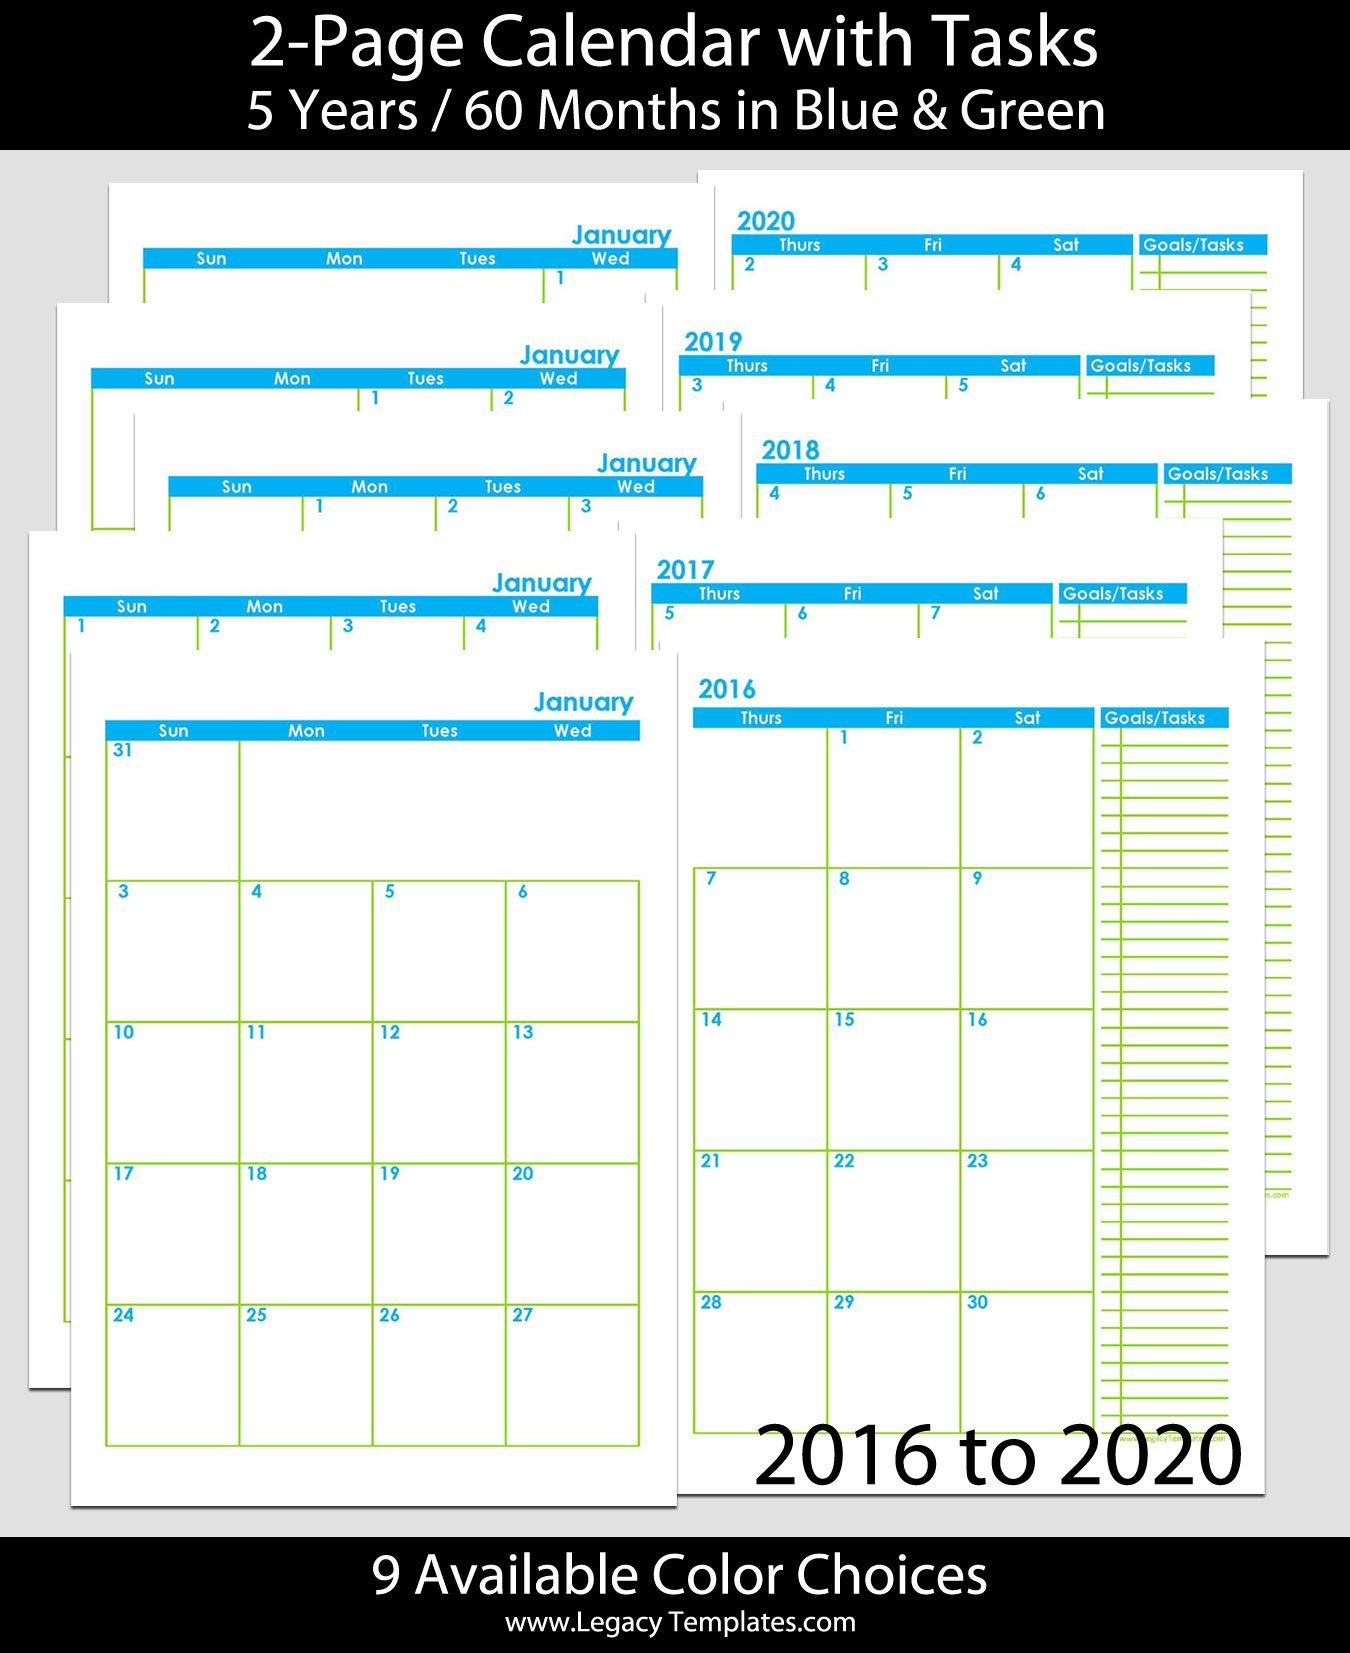 2016 Thru 2020 60-Months 2-Page Calendar - A5   Legacy Free Printable 8 X 11 May Calendar